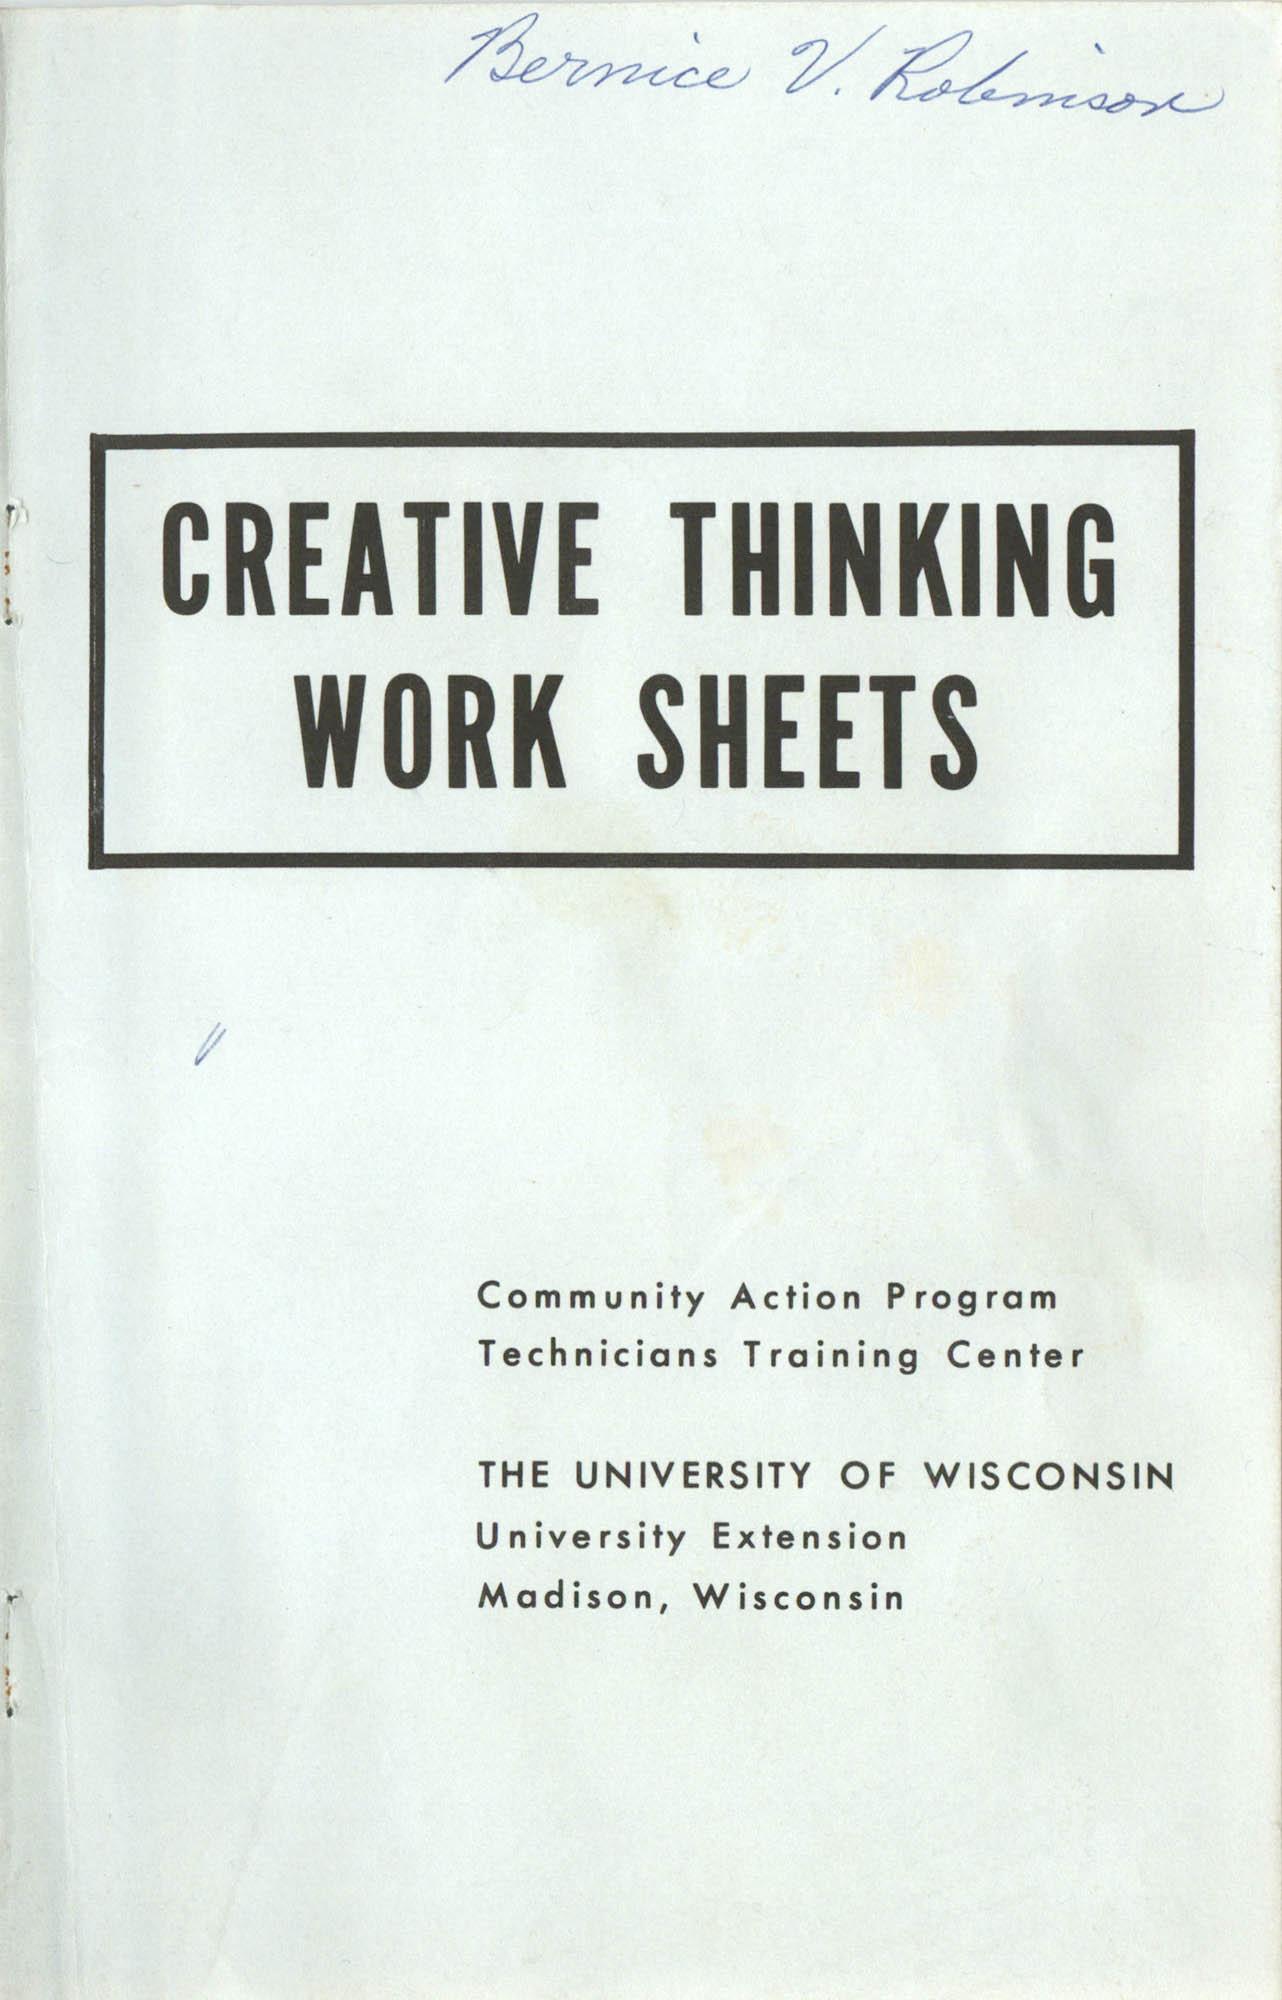 Creative Thinking Work Sheets